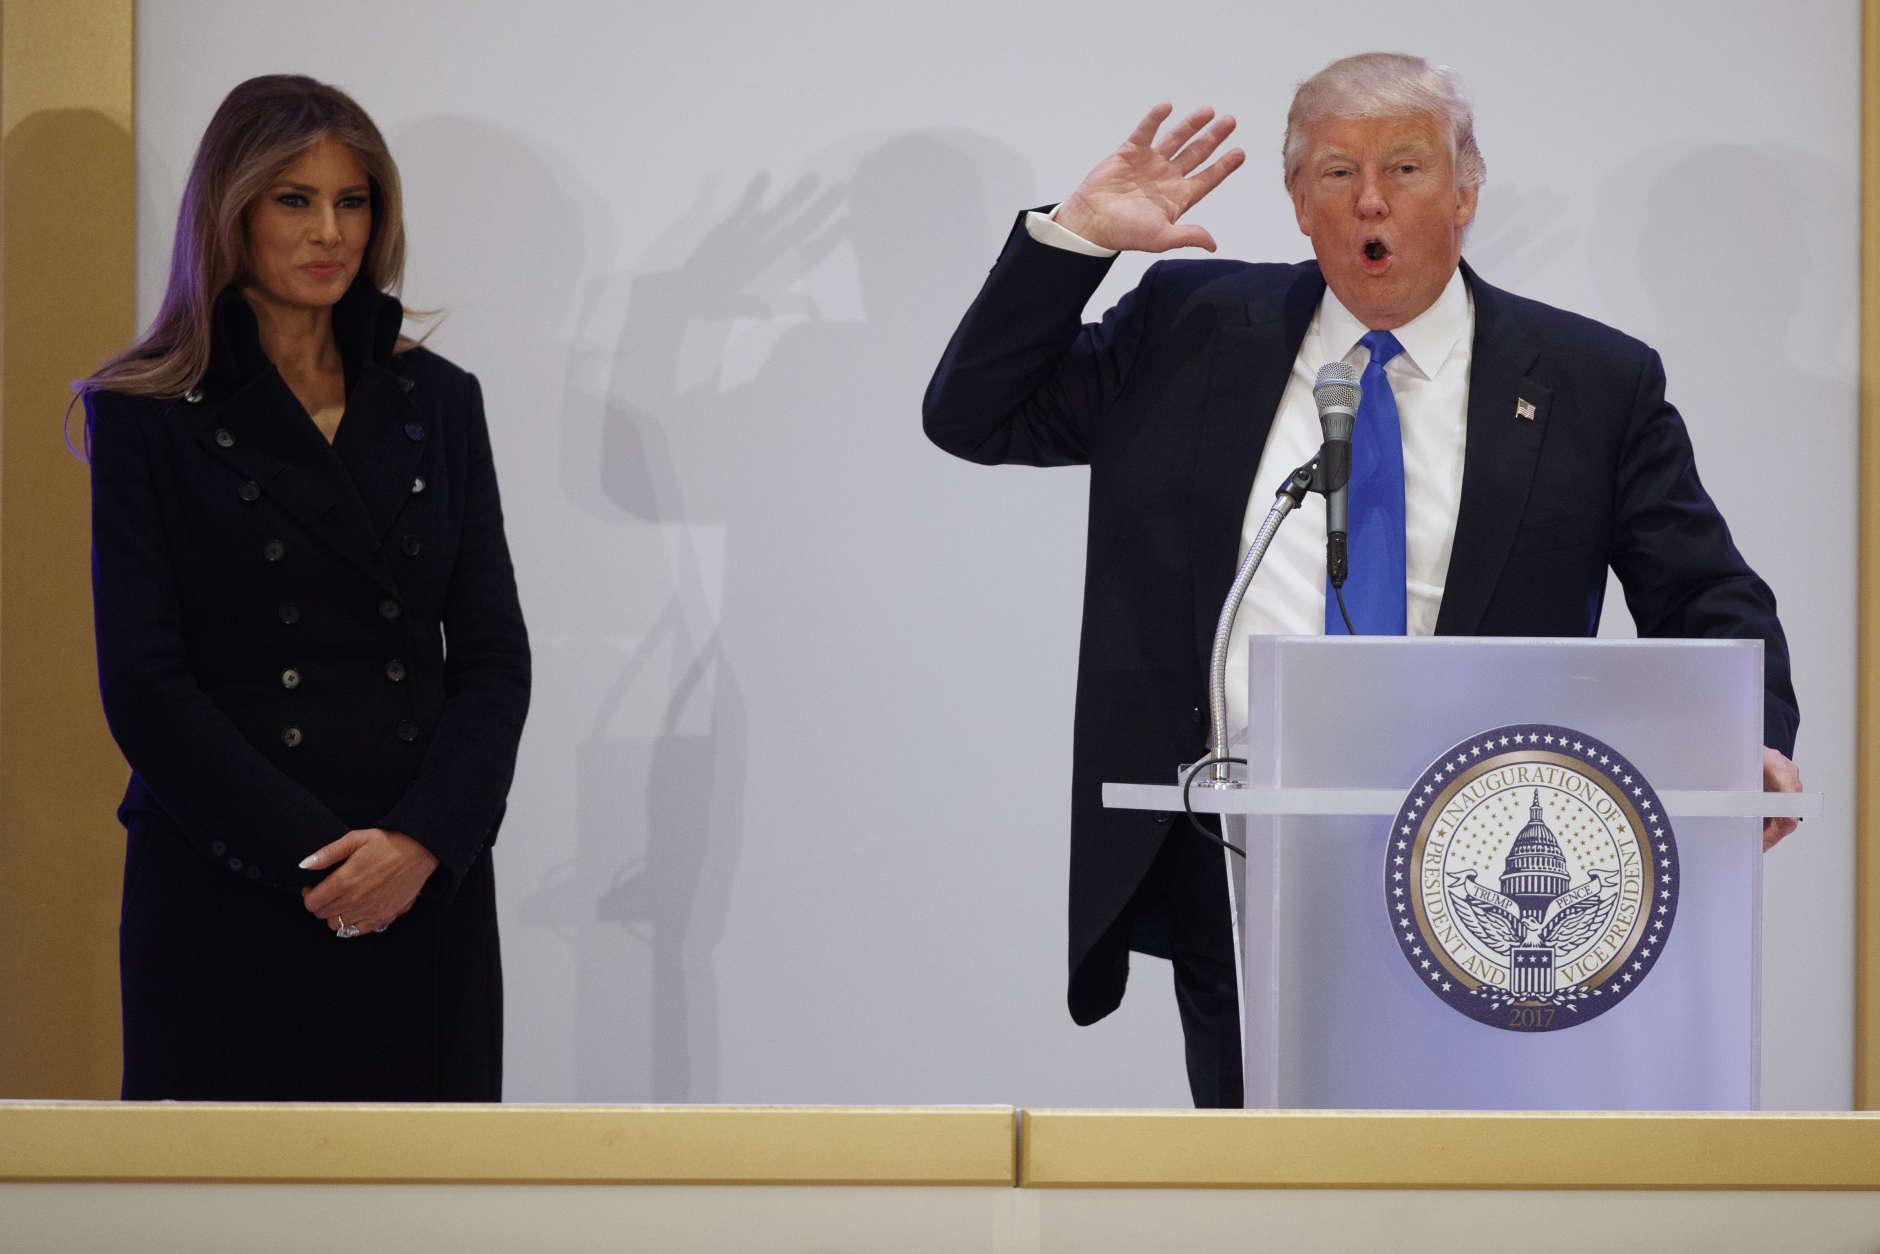 Melania Trump listens as her husband, President-elect Donald Trump speaks during the Leadership Luncheon at Trump International in Washington, Thursday, Jan. 19, 2017. (AP Photo/Evan Vucci)